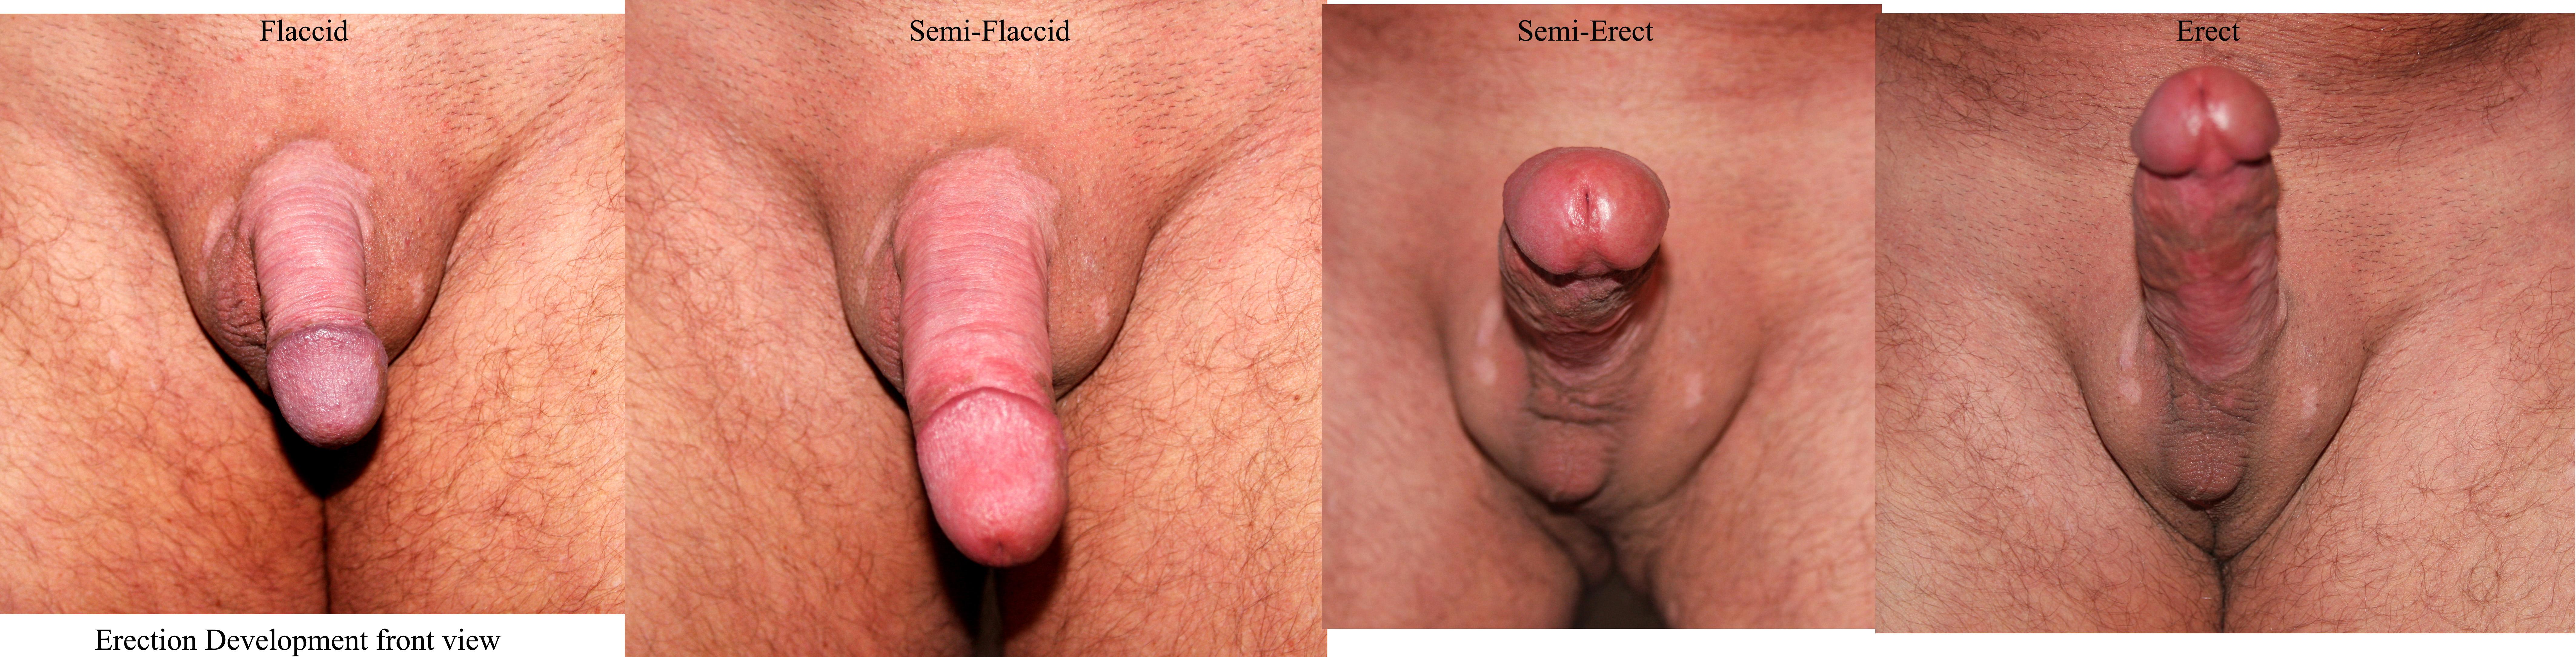 pics of hairy female bellies